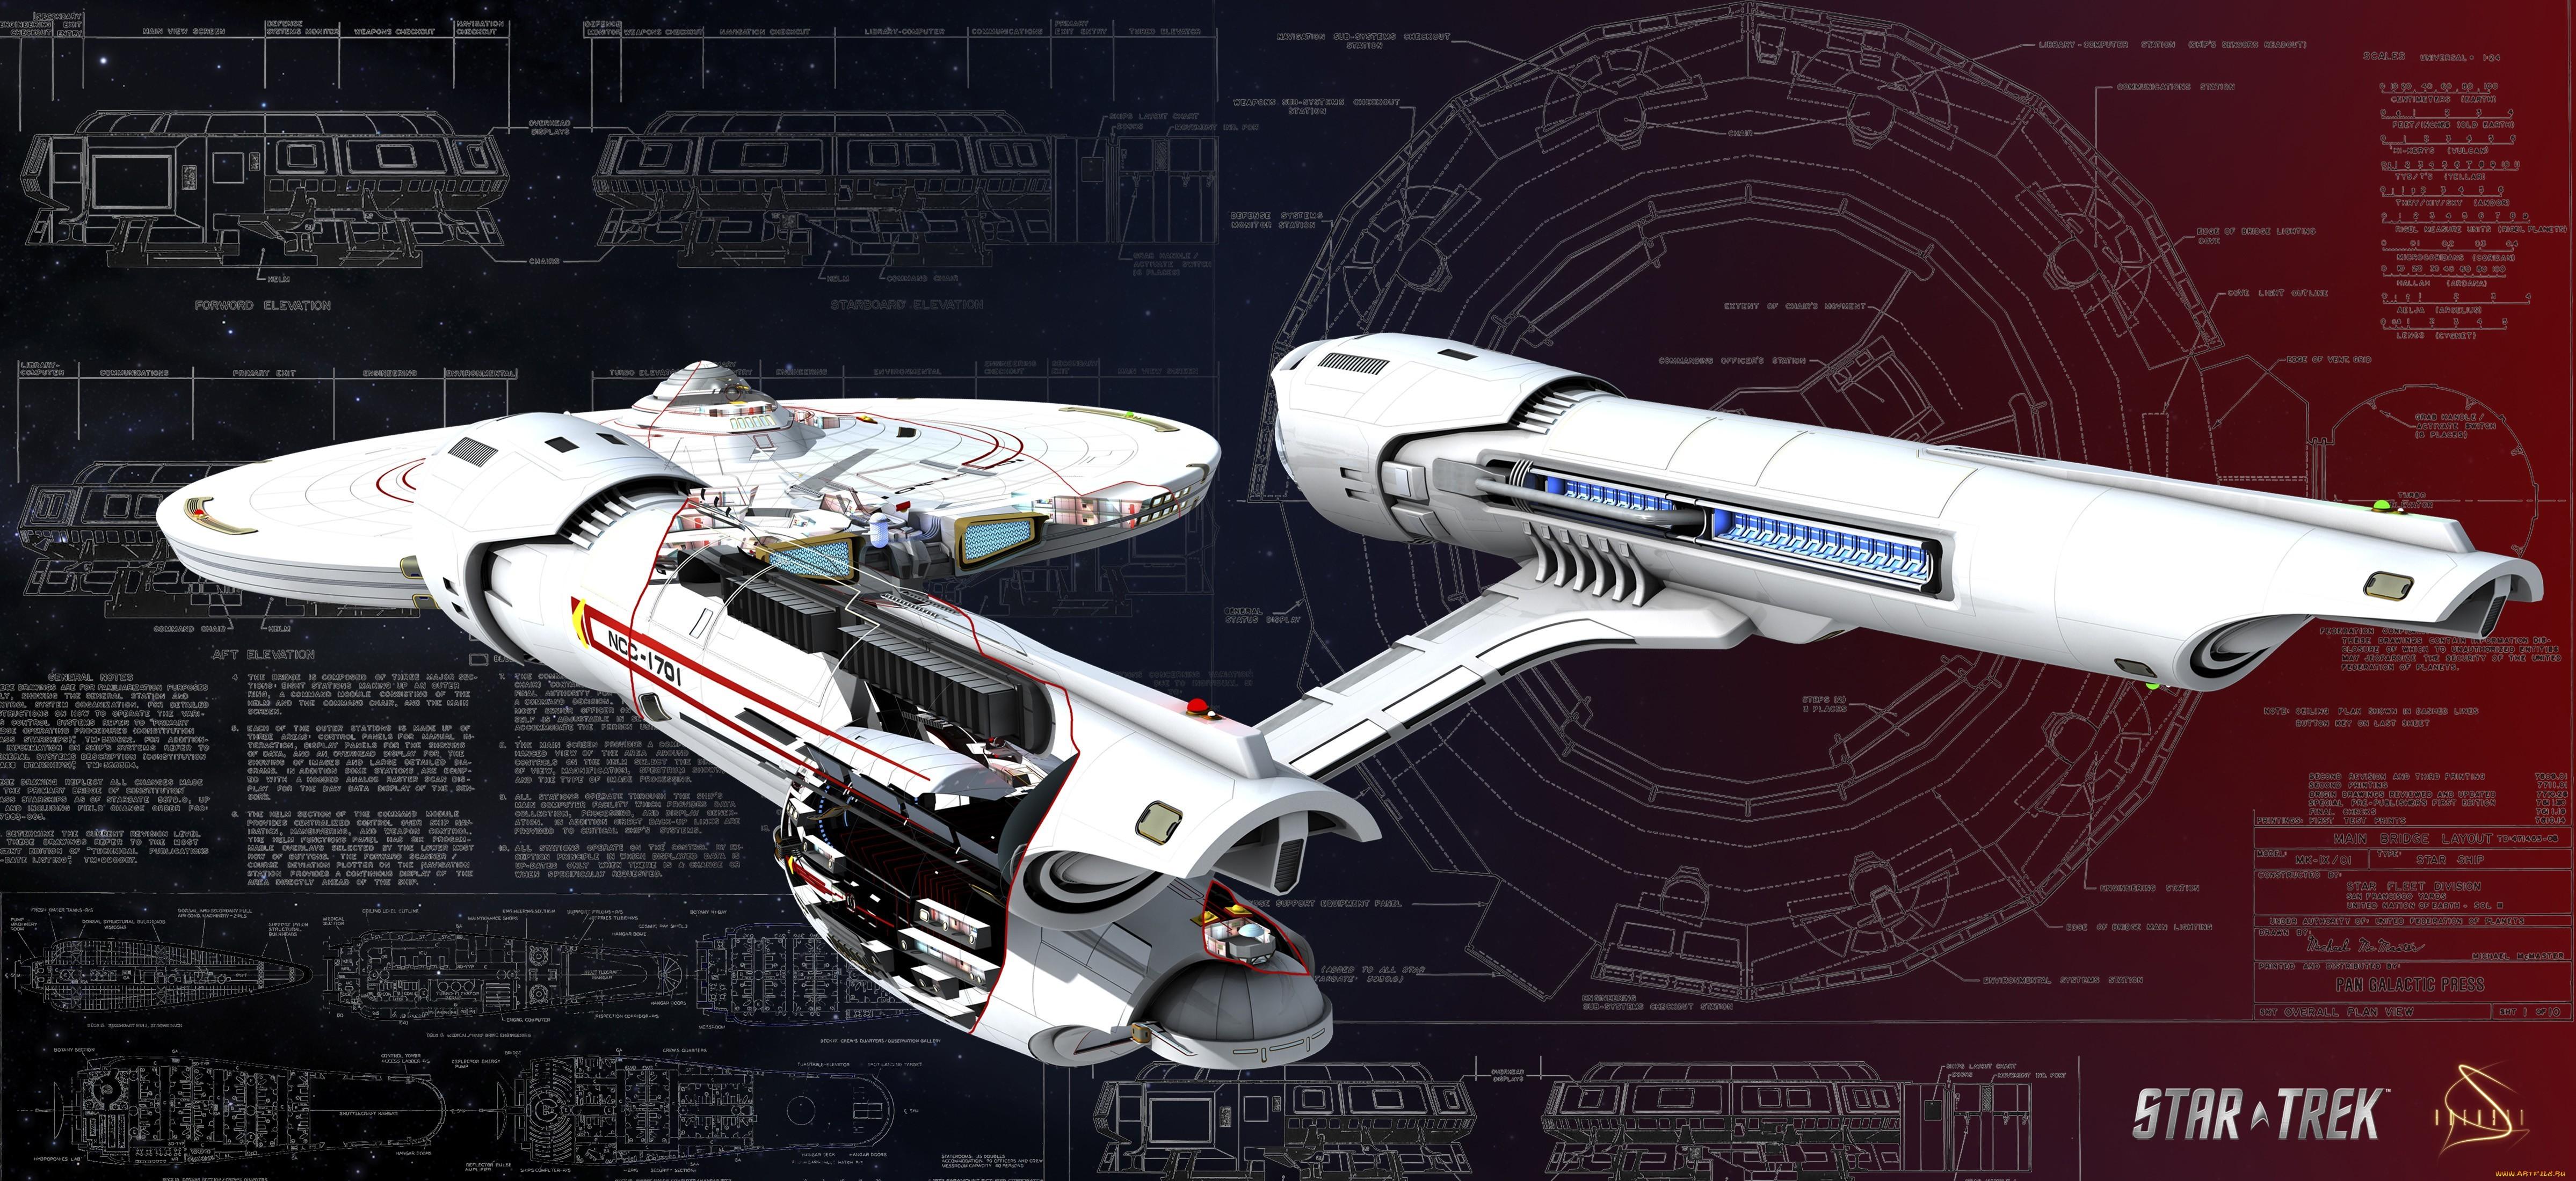 Star Trek 4797x2200